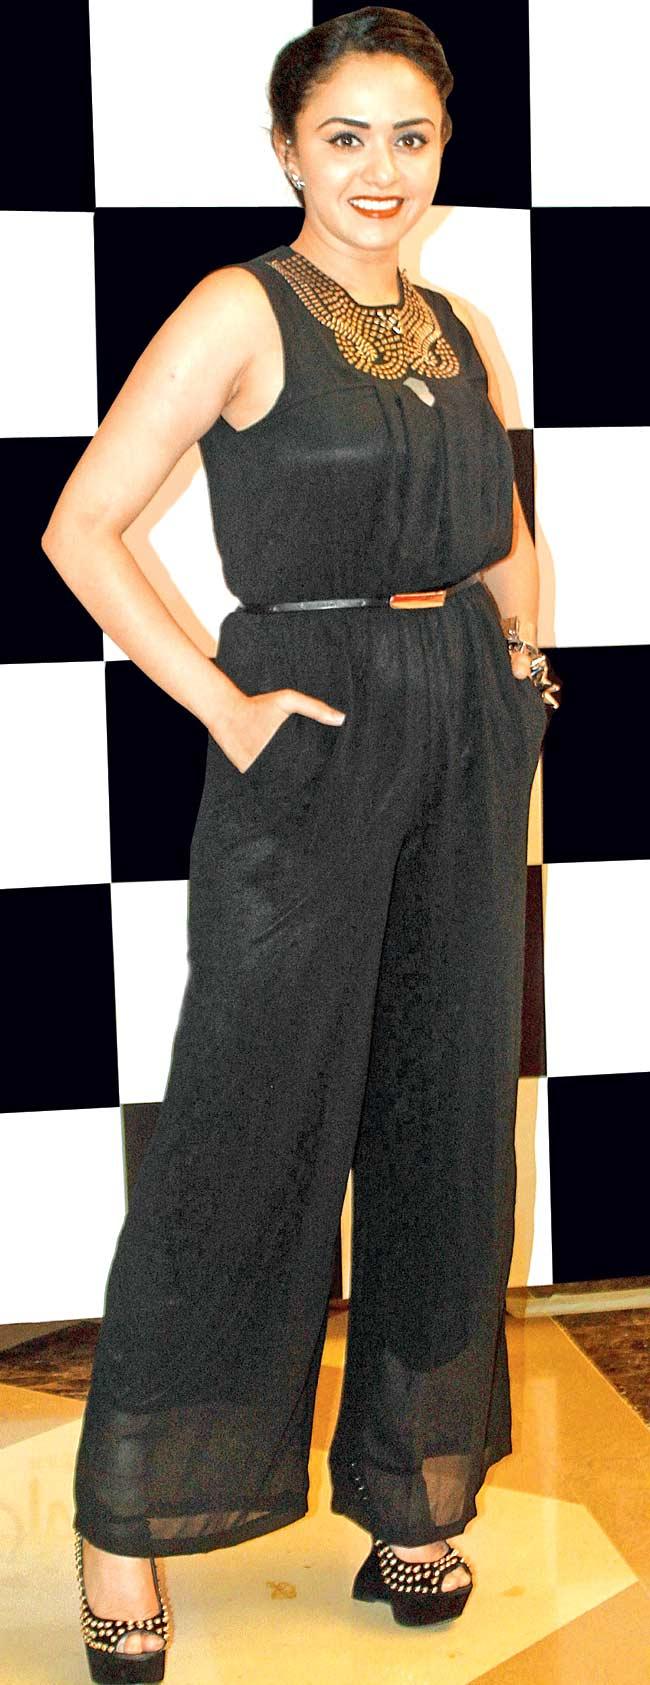 Amruta-Khanvilkar-at-a-Gudi-Padwa-bash-Style-Fashion-Beauty-Bollywood-Hindu-Marathi-wallpaper-wp5602859